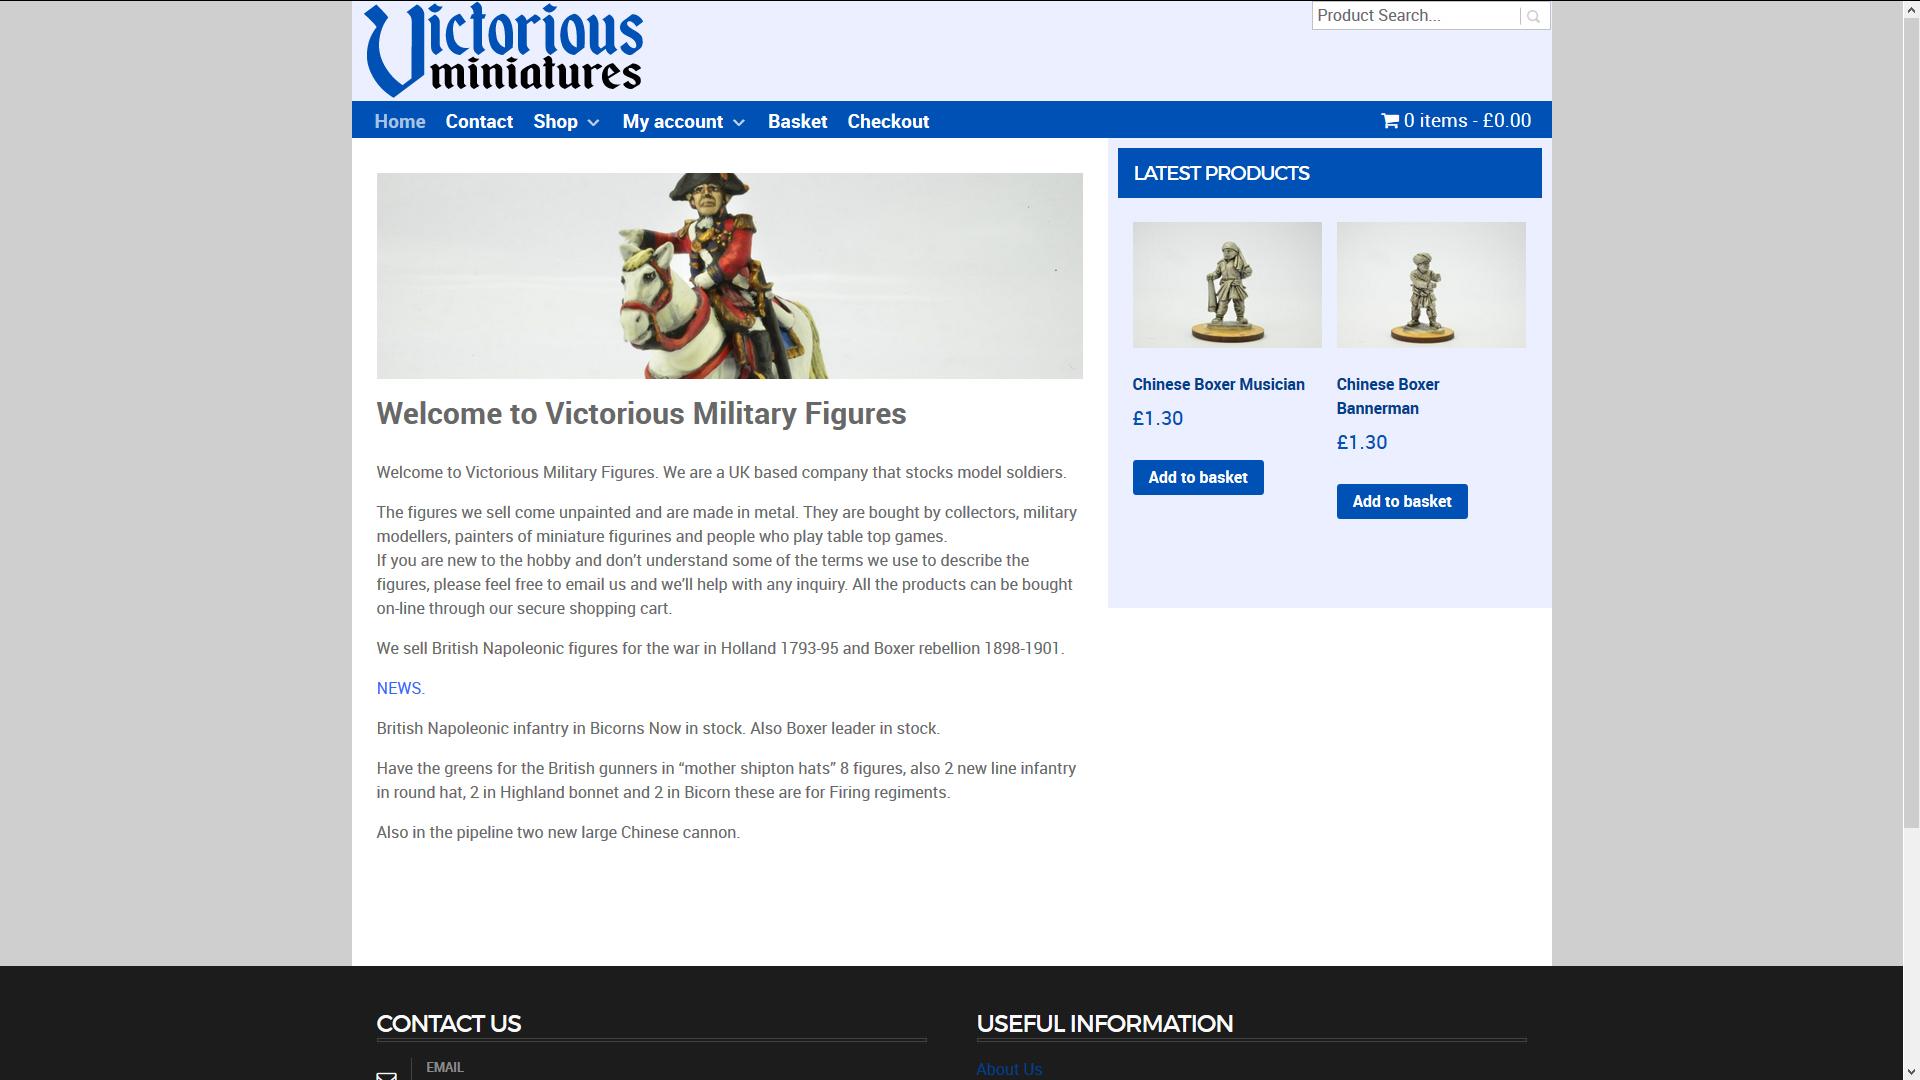 Victorious Miniatures